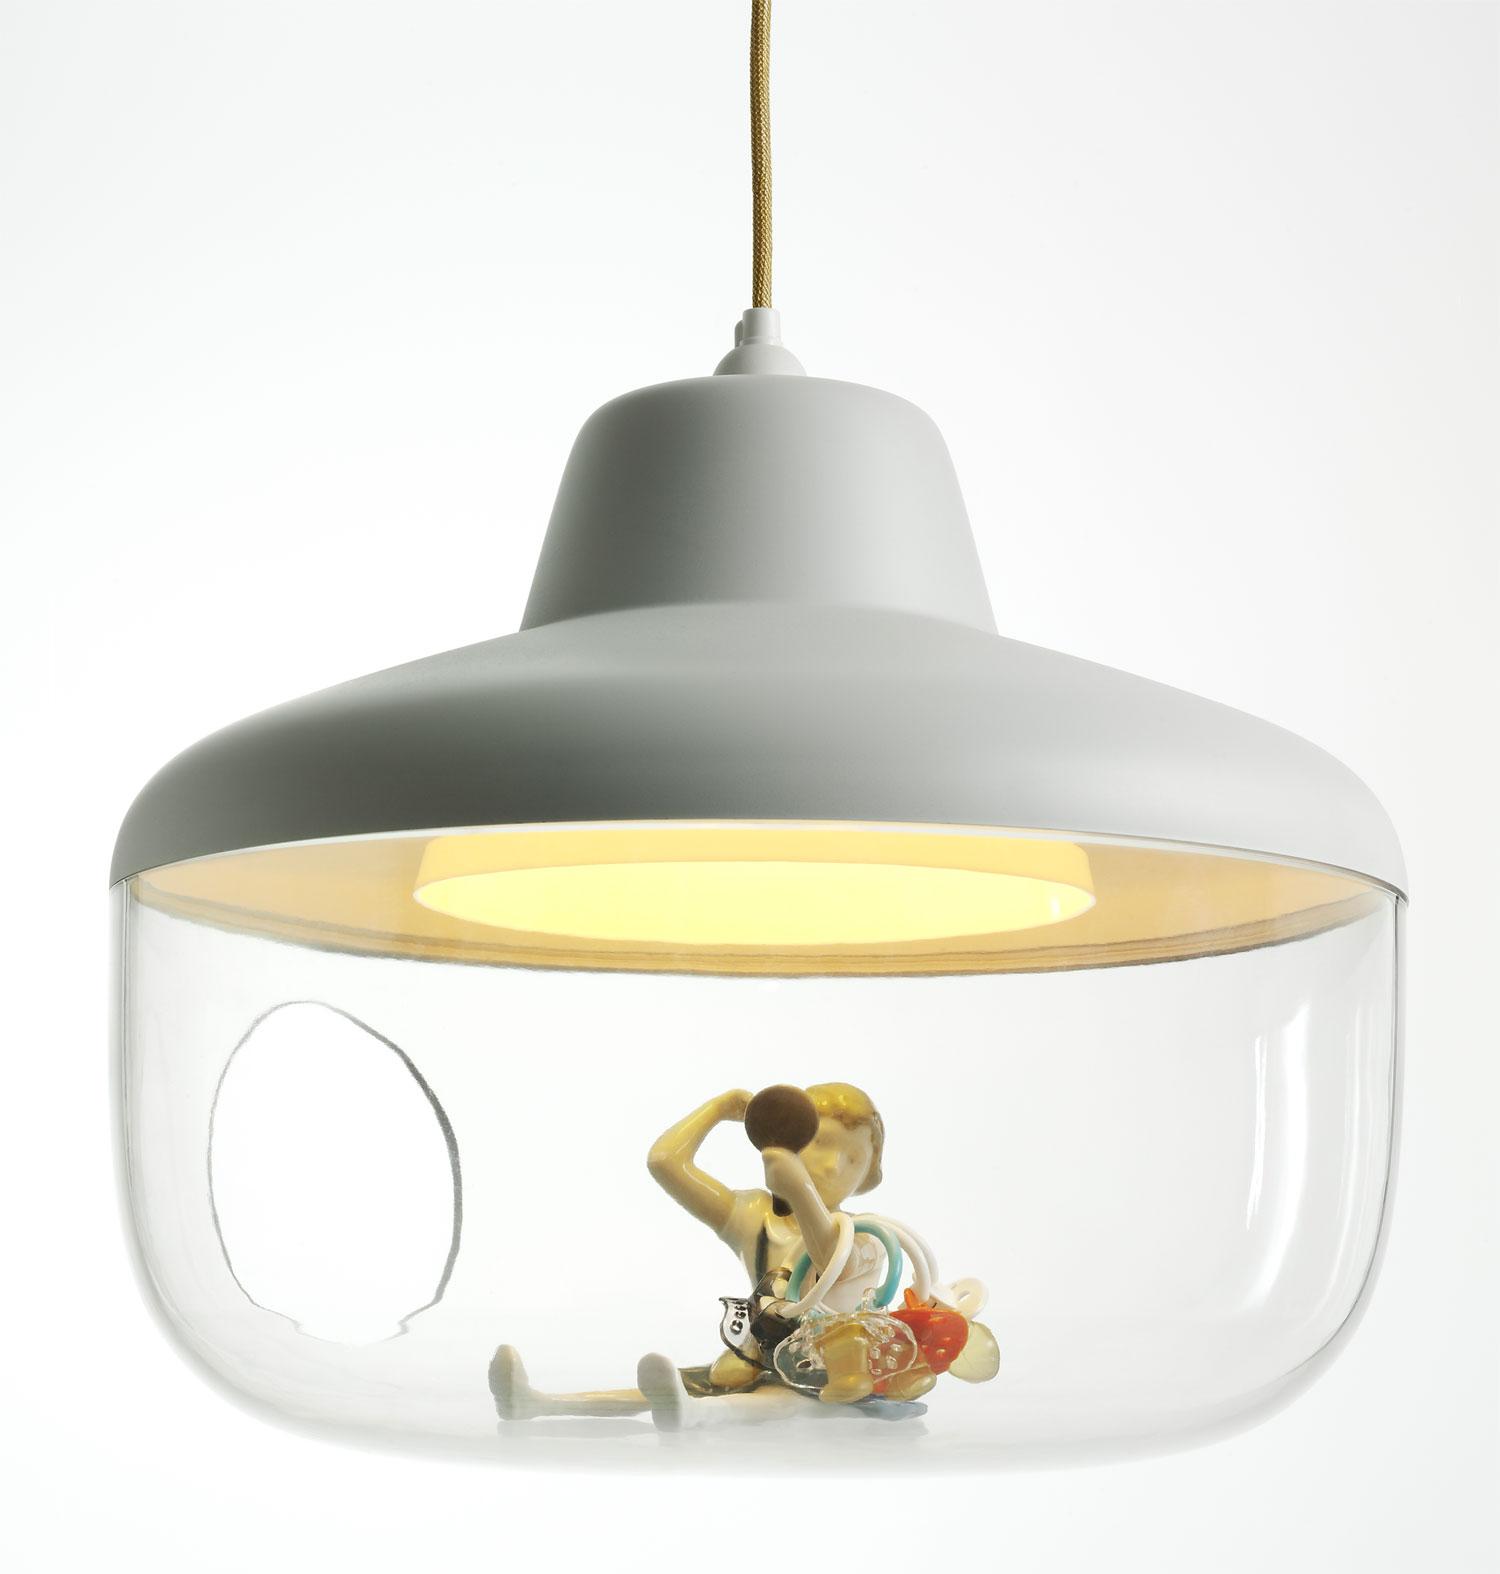 Pendant Lighting Track System For Kitchen Island